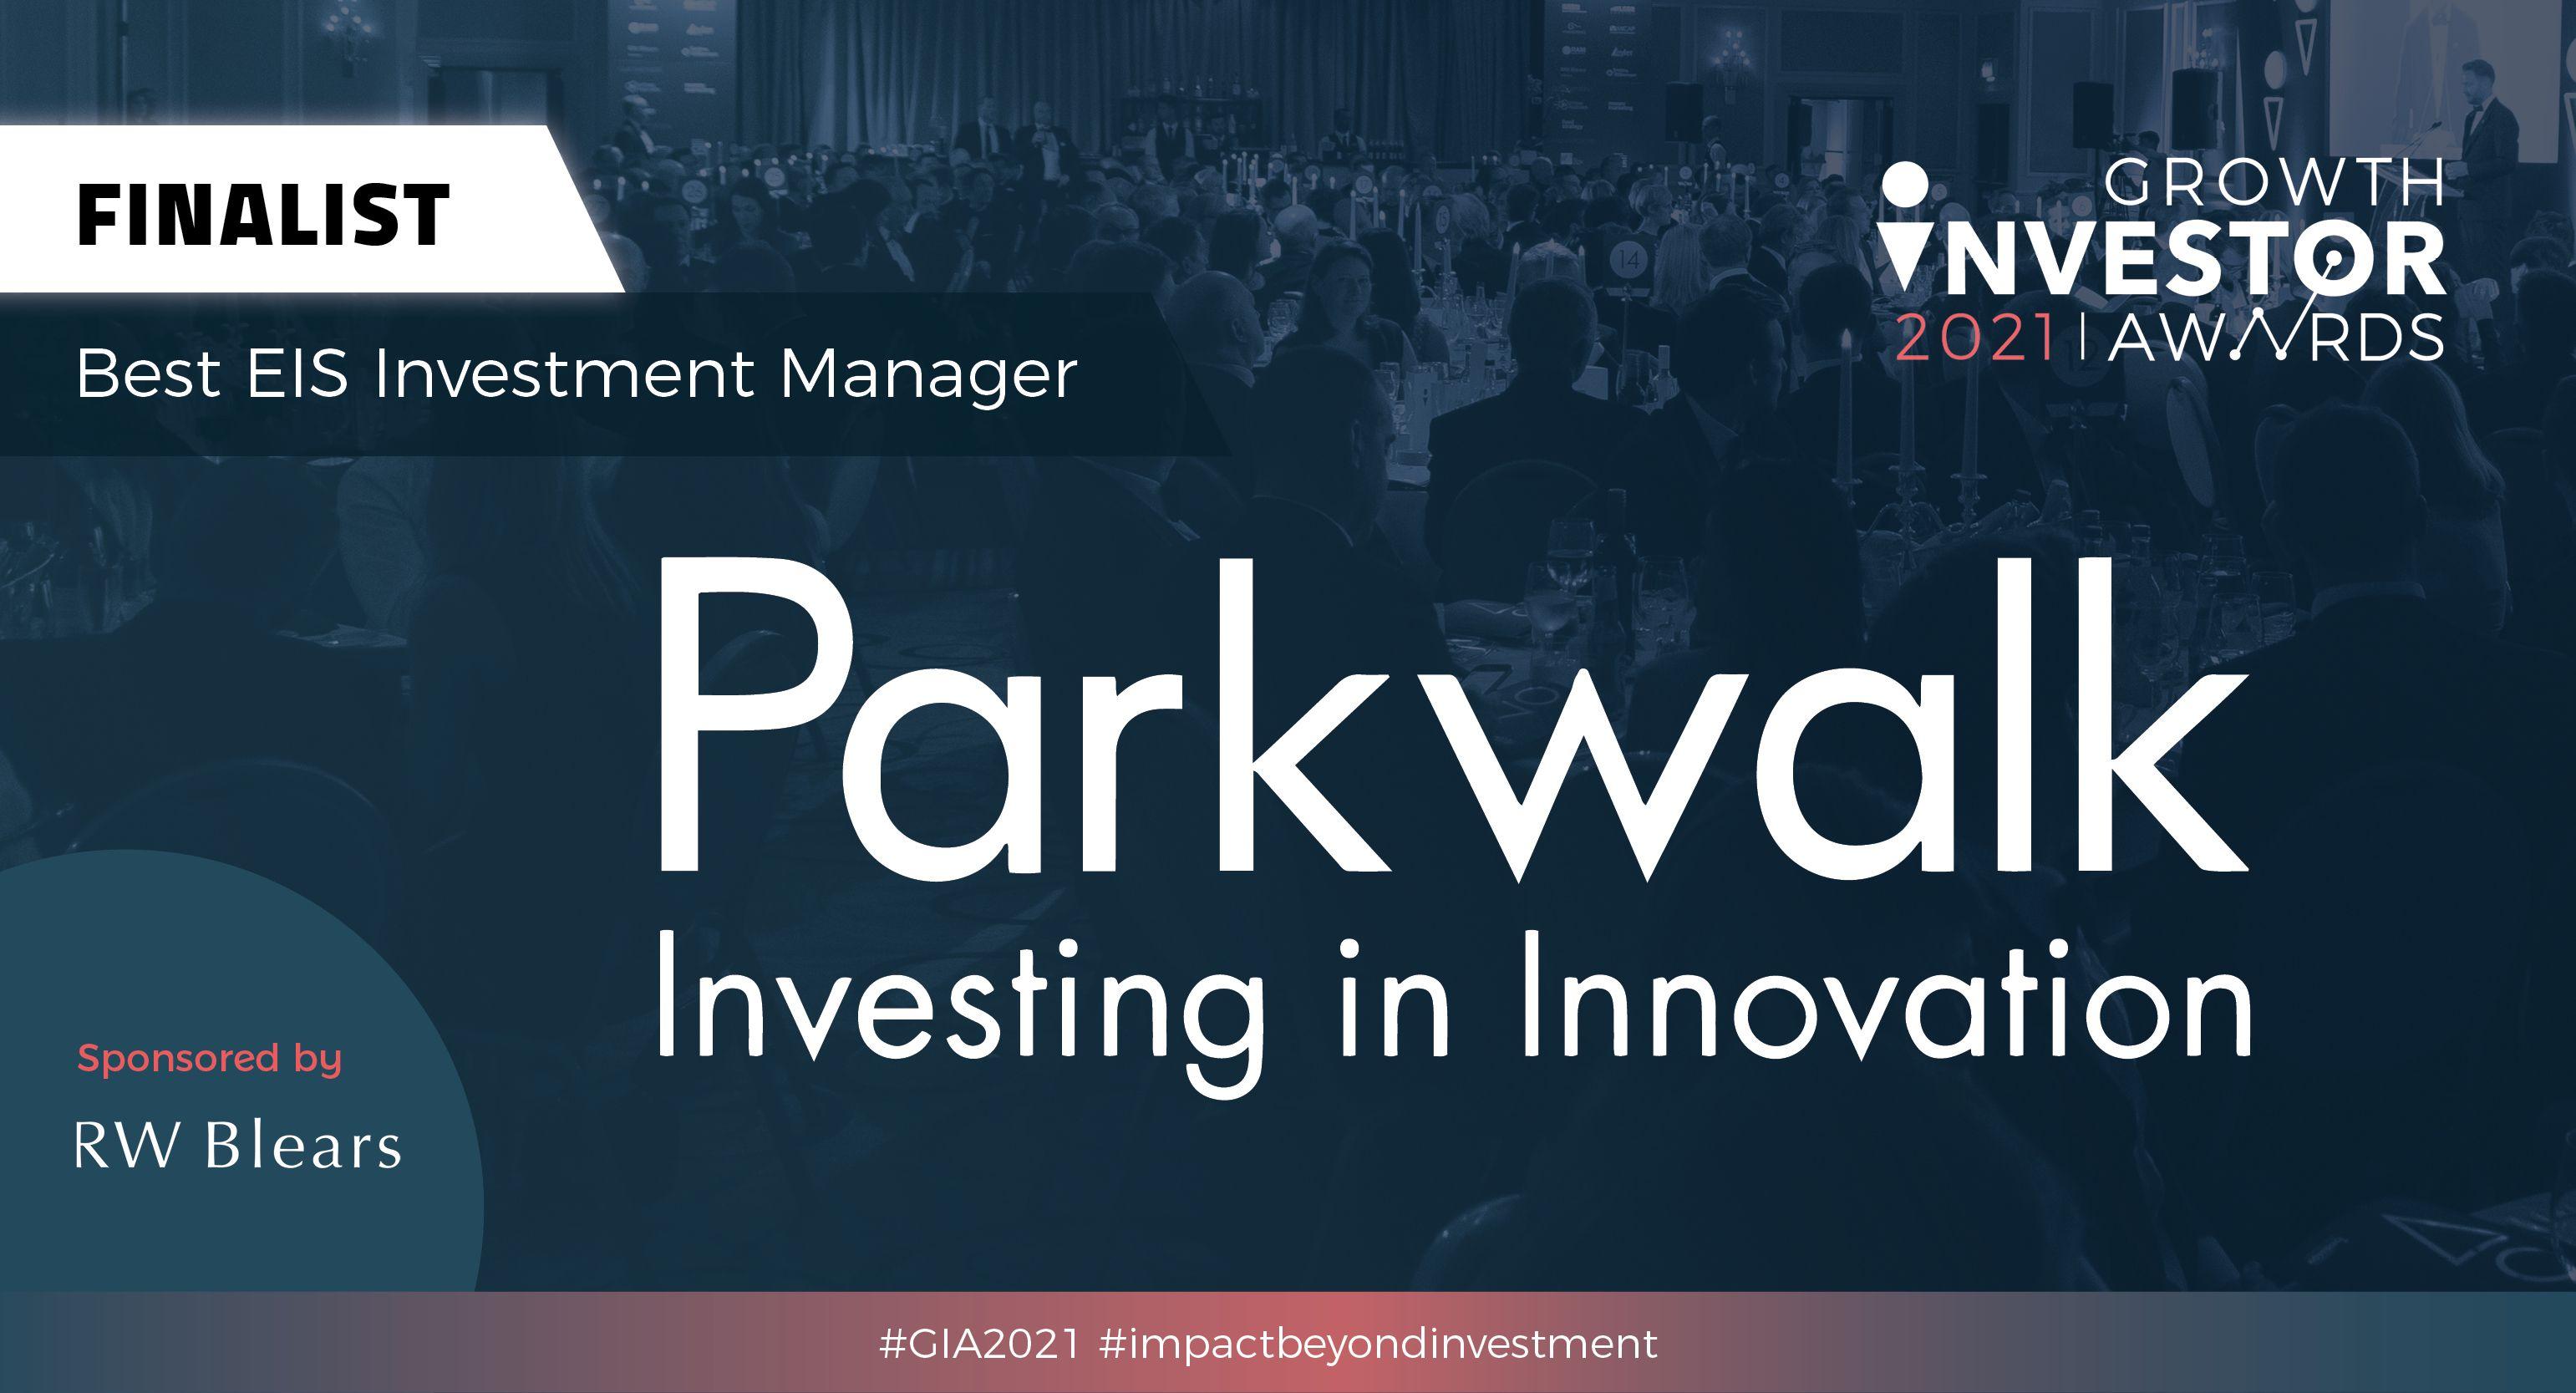 Parkwalk – Growth Investor Awards 2021 finalist